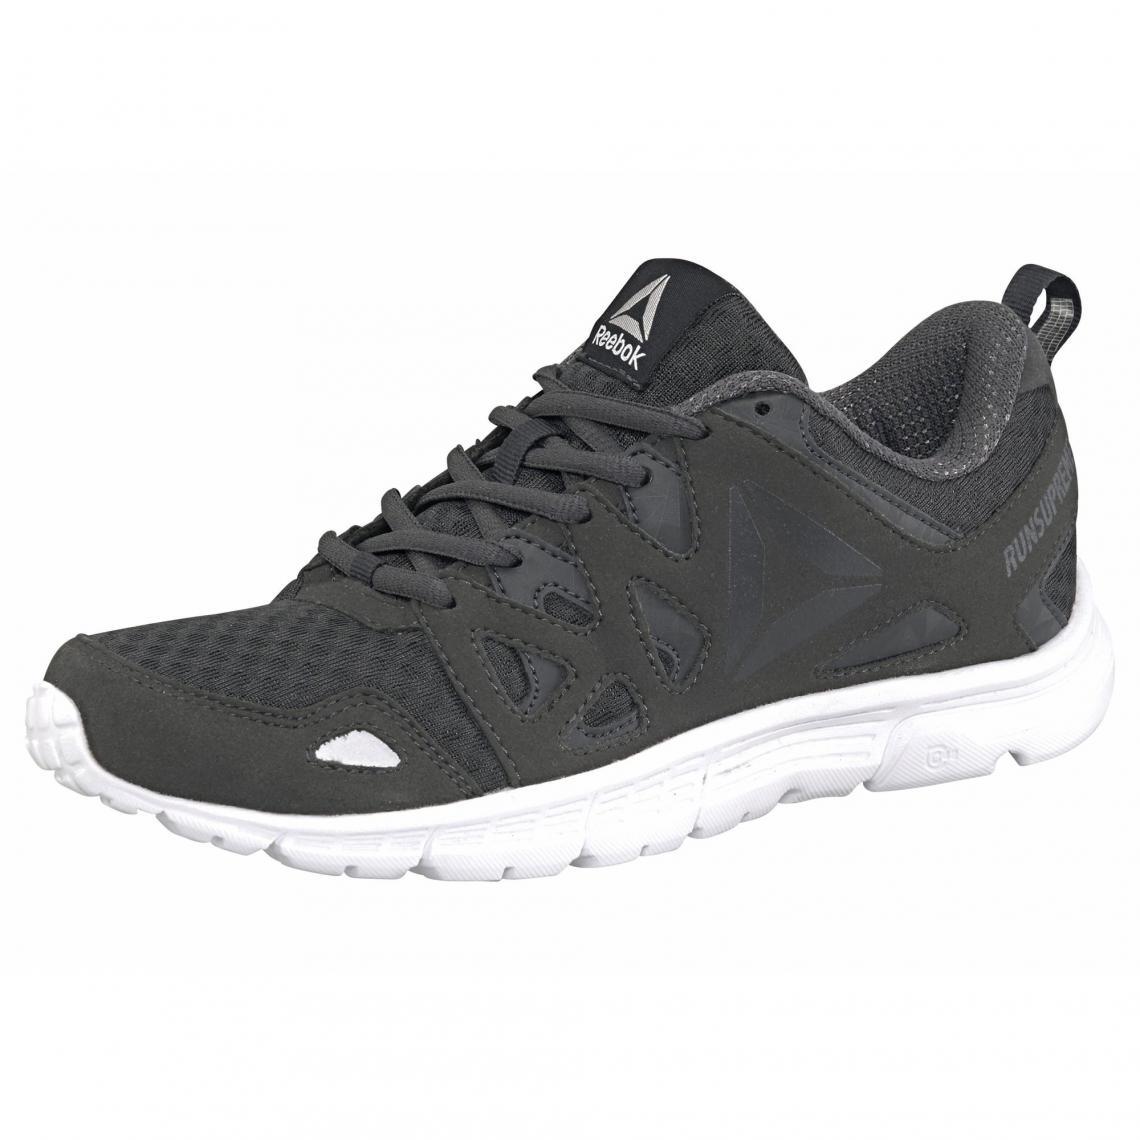 new product b95da 9e6ec Sneaker femme Run Supreme 3.0 Wmn Reebok - Gris Anthracite Reebok Femme